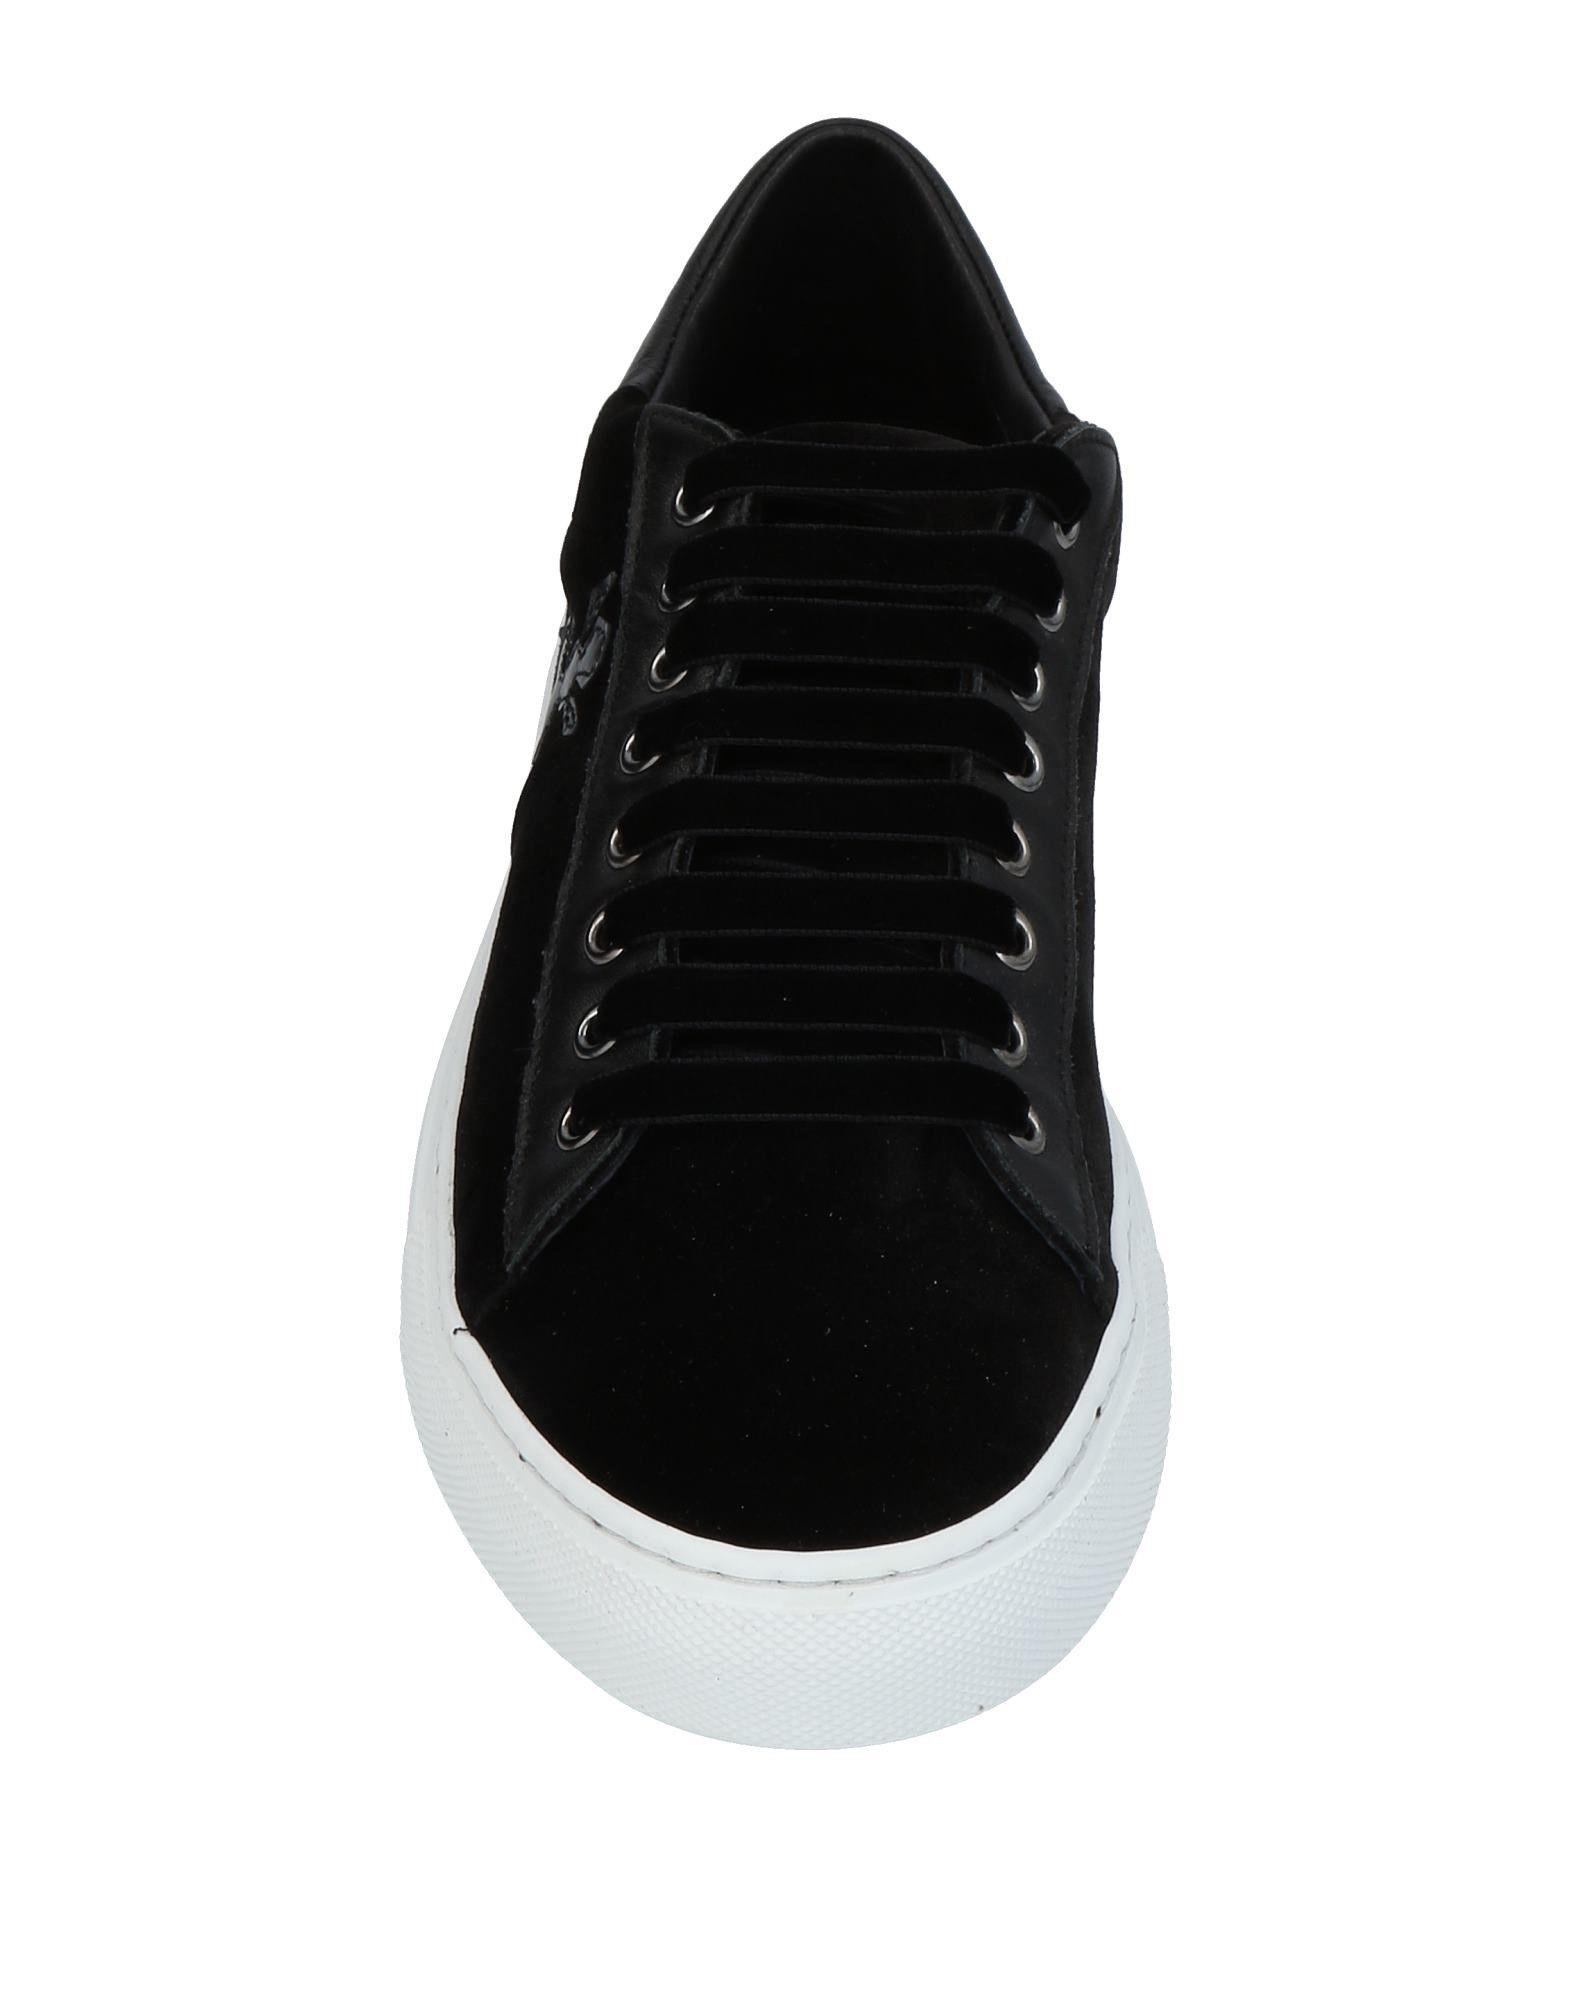 Gut um billige Damen Schuhe zu tragenPatrizia Pepe Sneakers Damen billige  11432002ED 417731